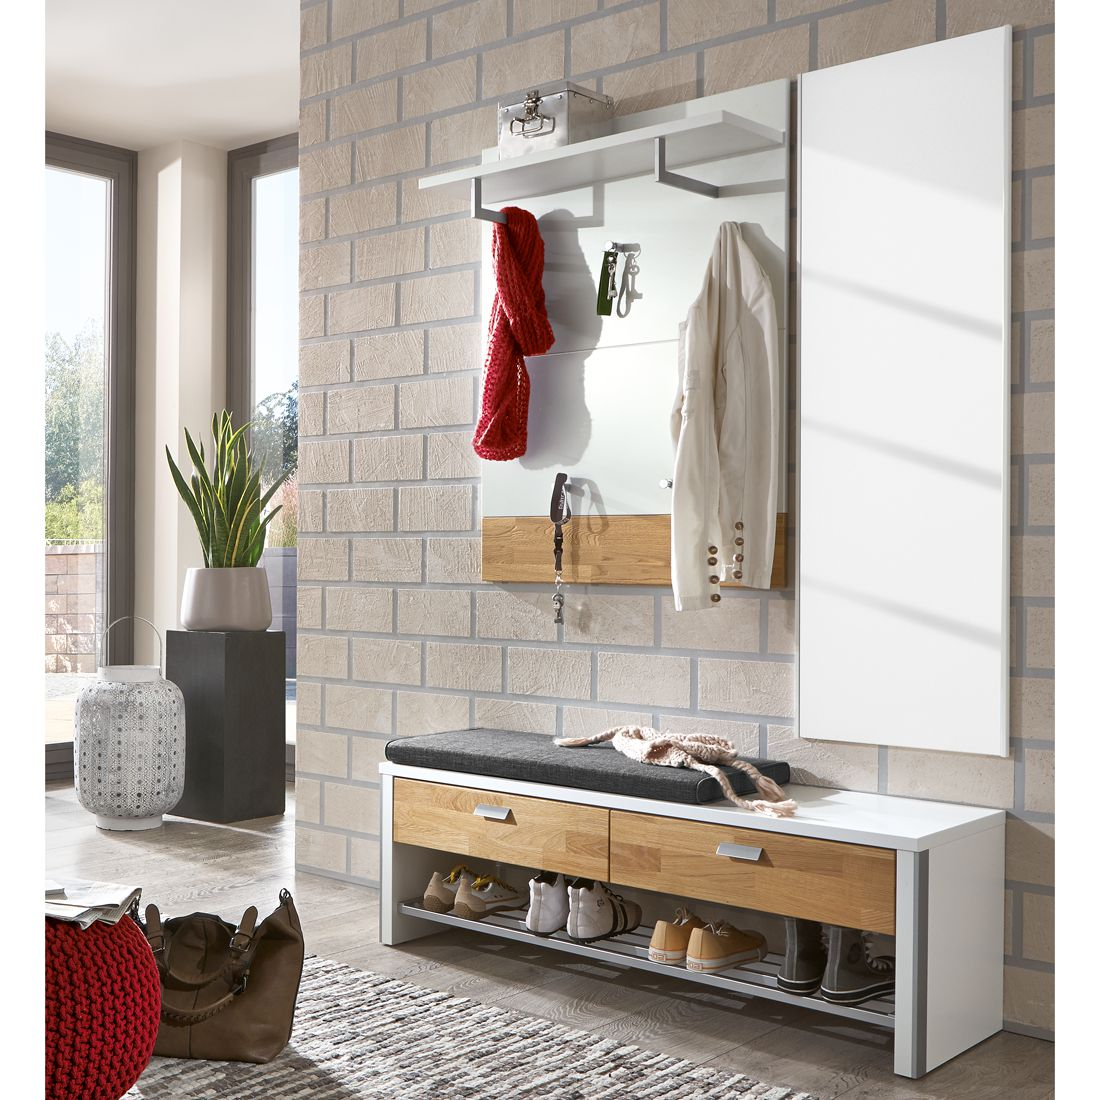 garderobenset bolton i 4 teilig wei eiche massiv voss. Black Bedroom Furniture Sets. Home Design Ideas